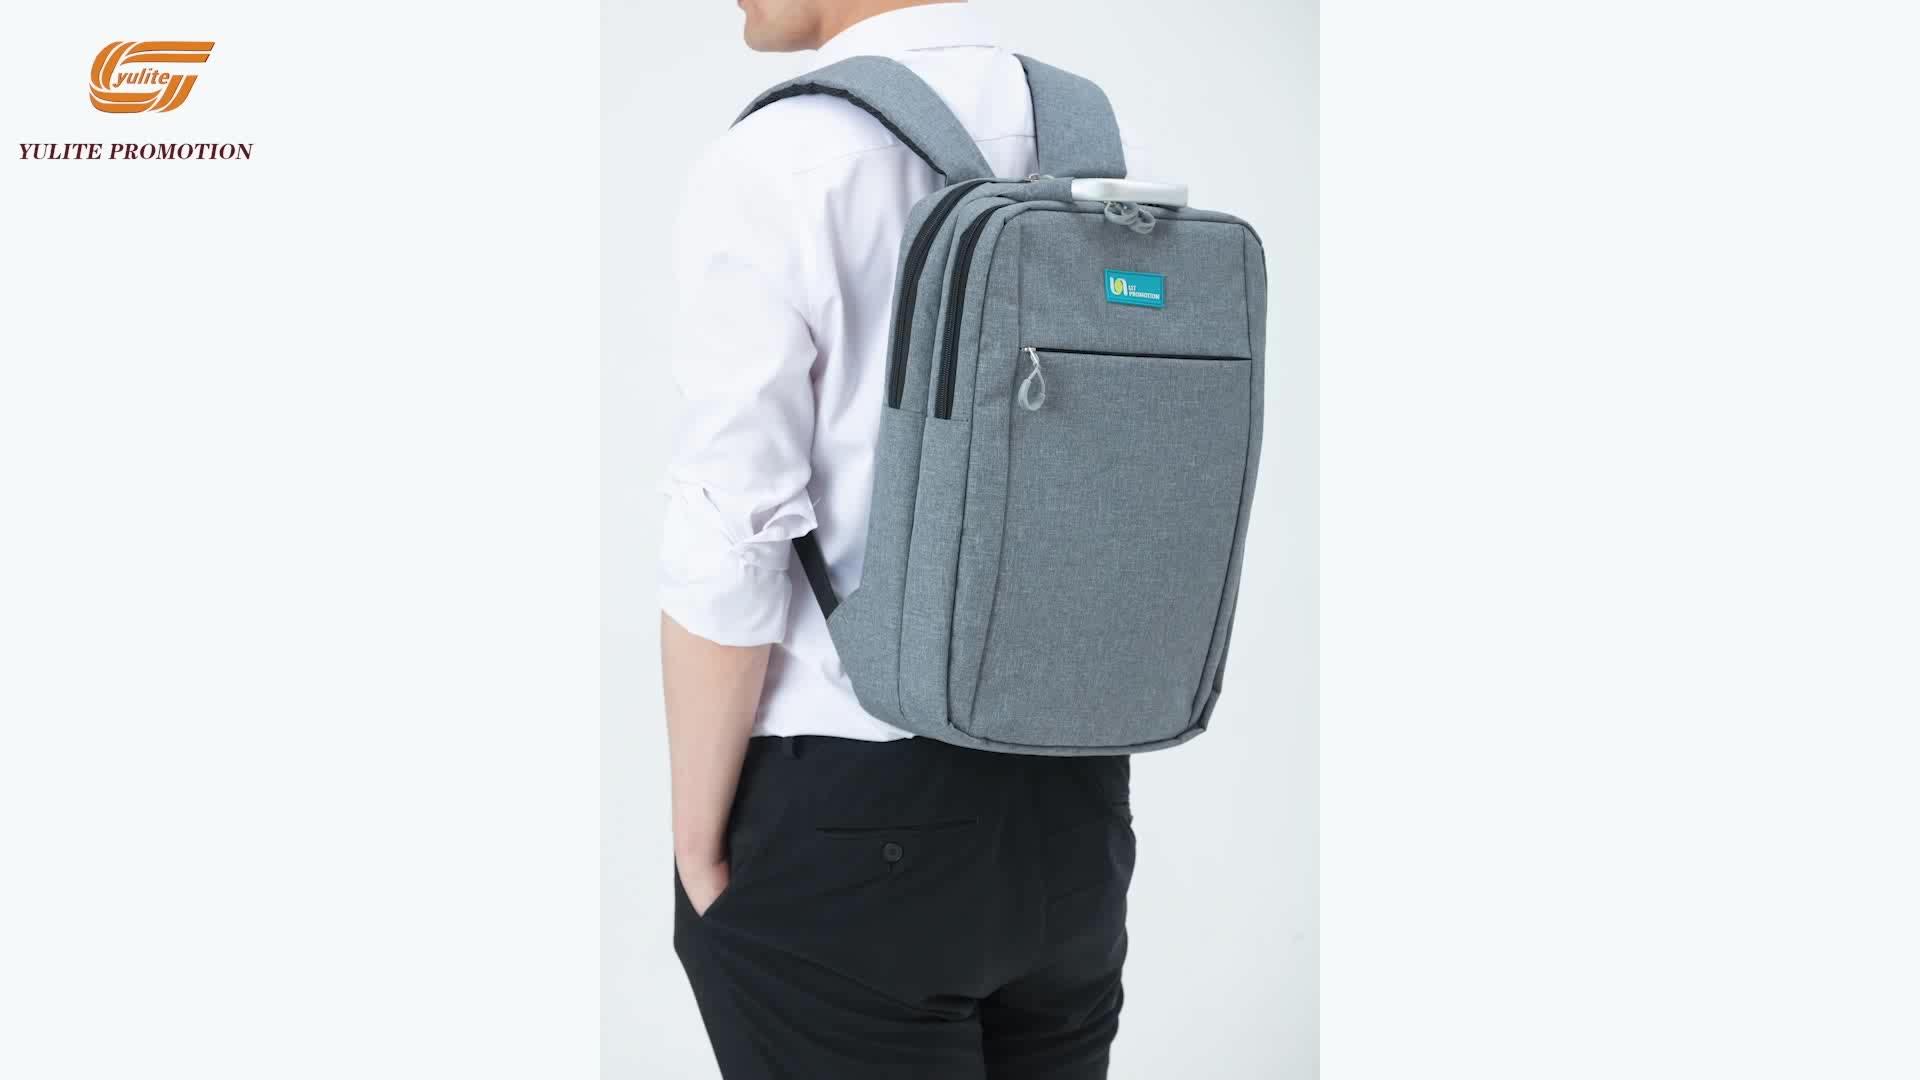 2020 पुरुषों व्यापार लैपटॉप बैग, दैनिक व्यापार अटैची